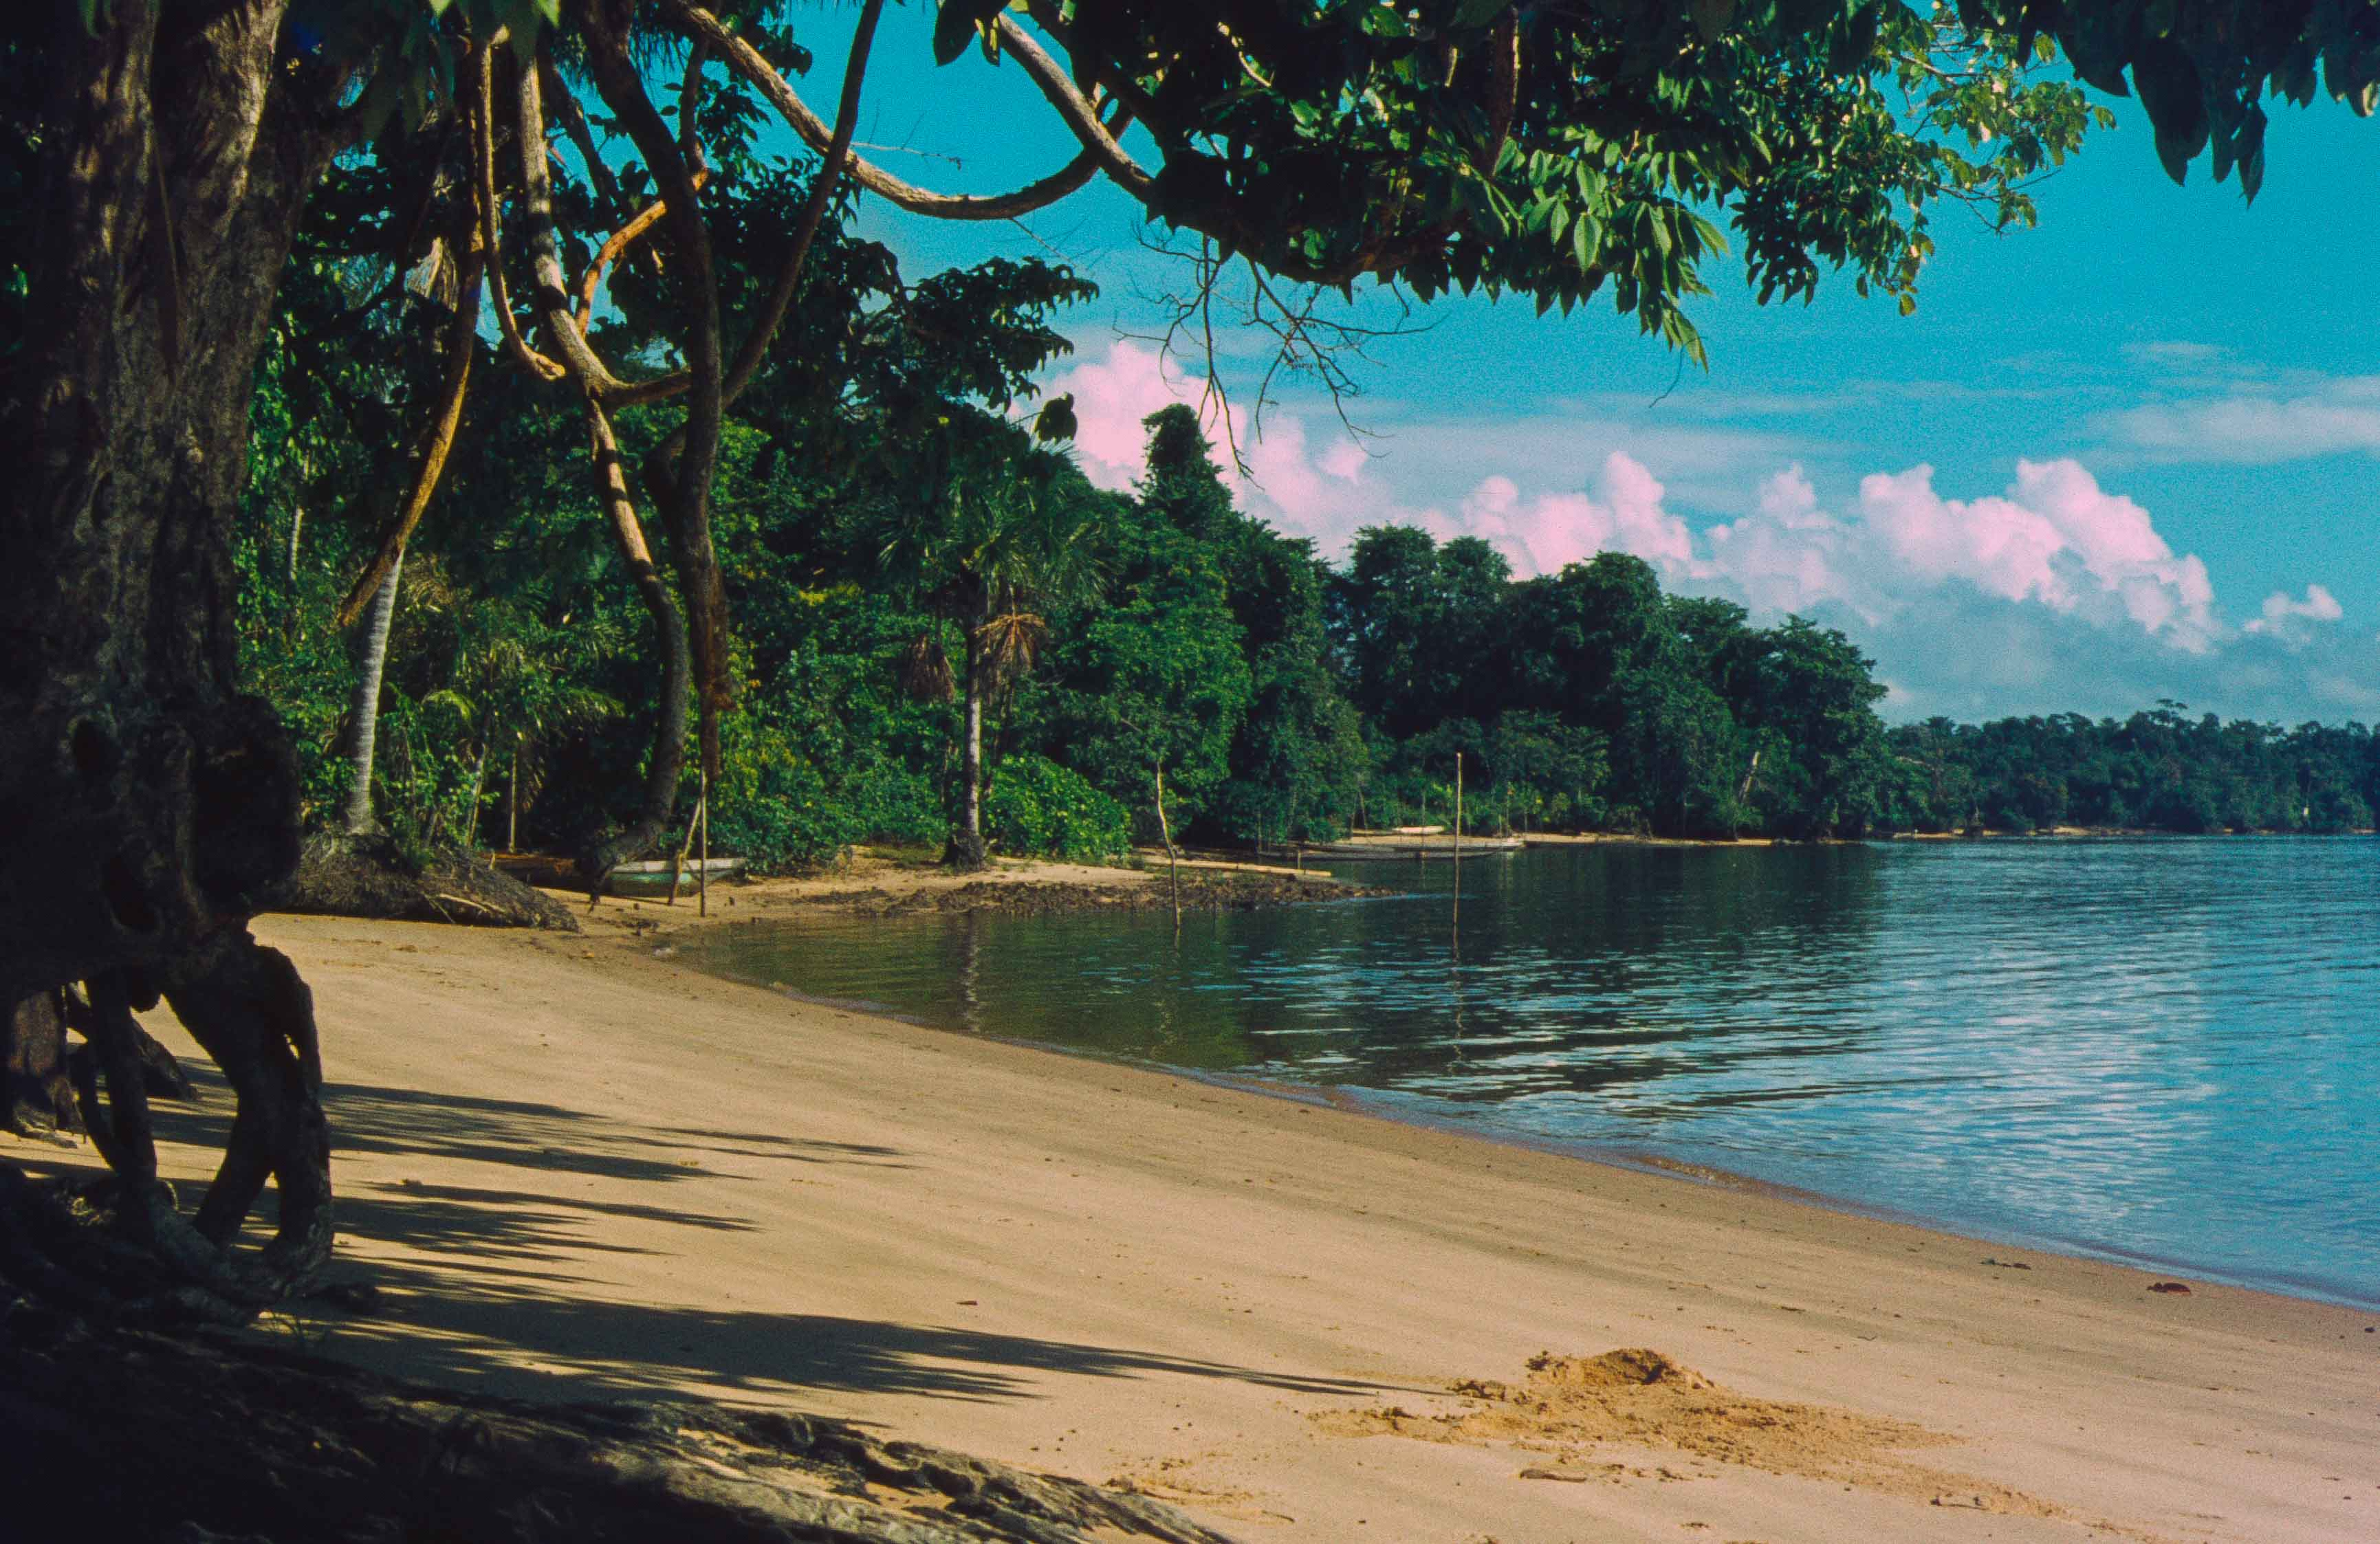 391. Suriname